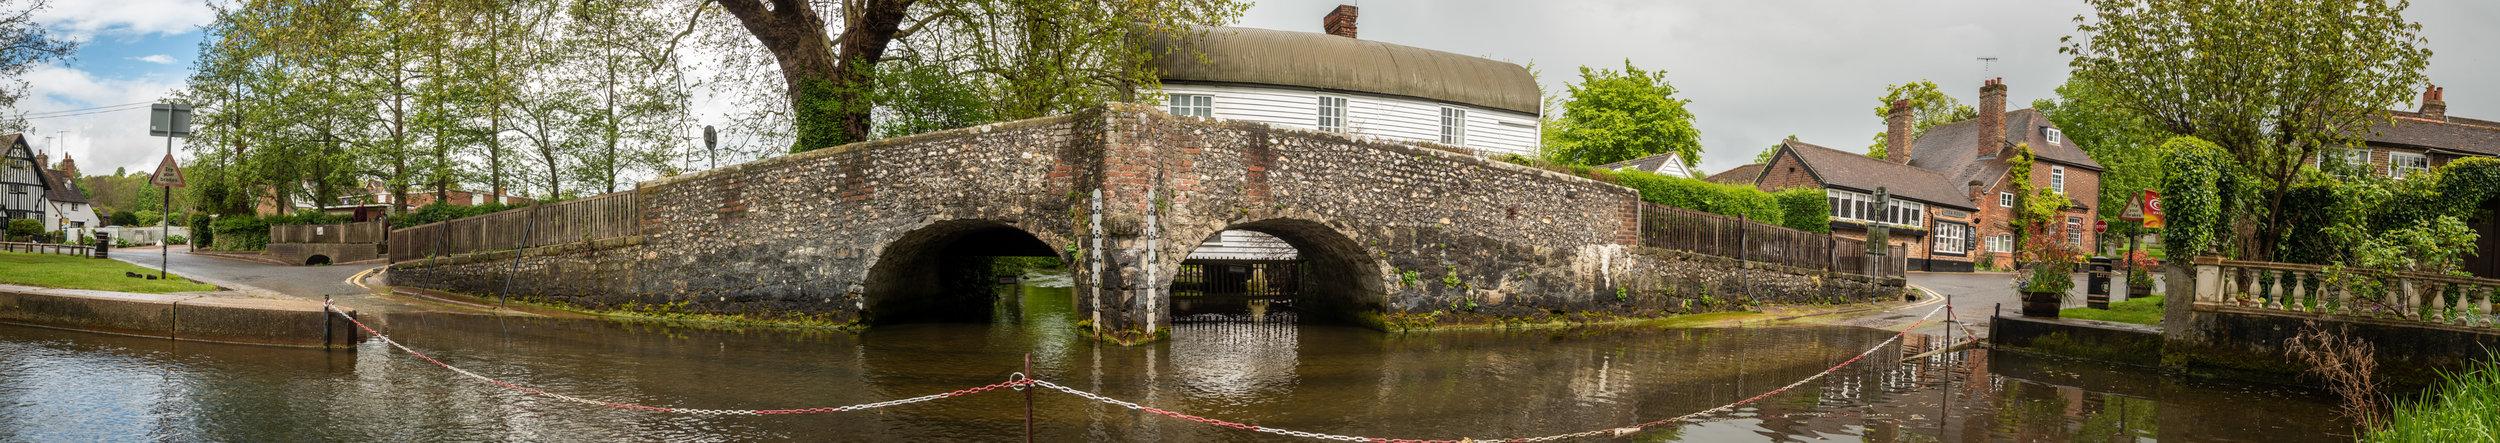 The Bridge & Ford at Eynsford